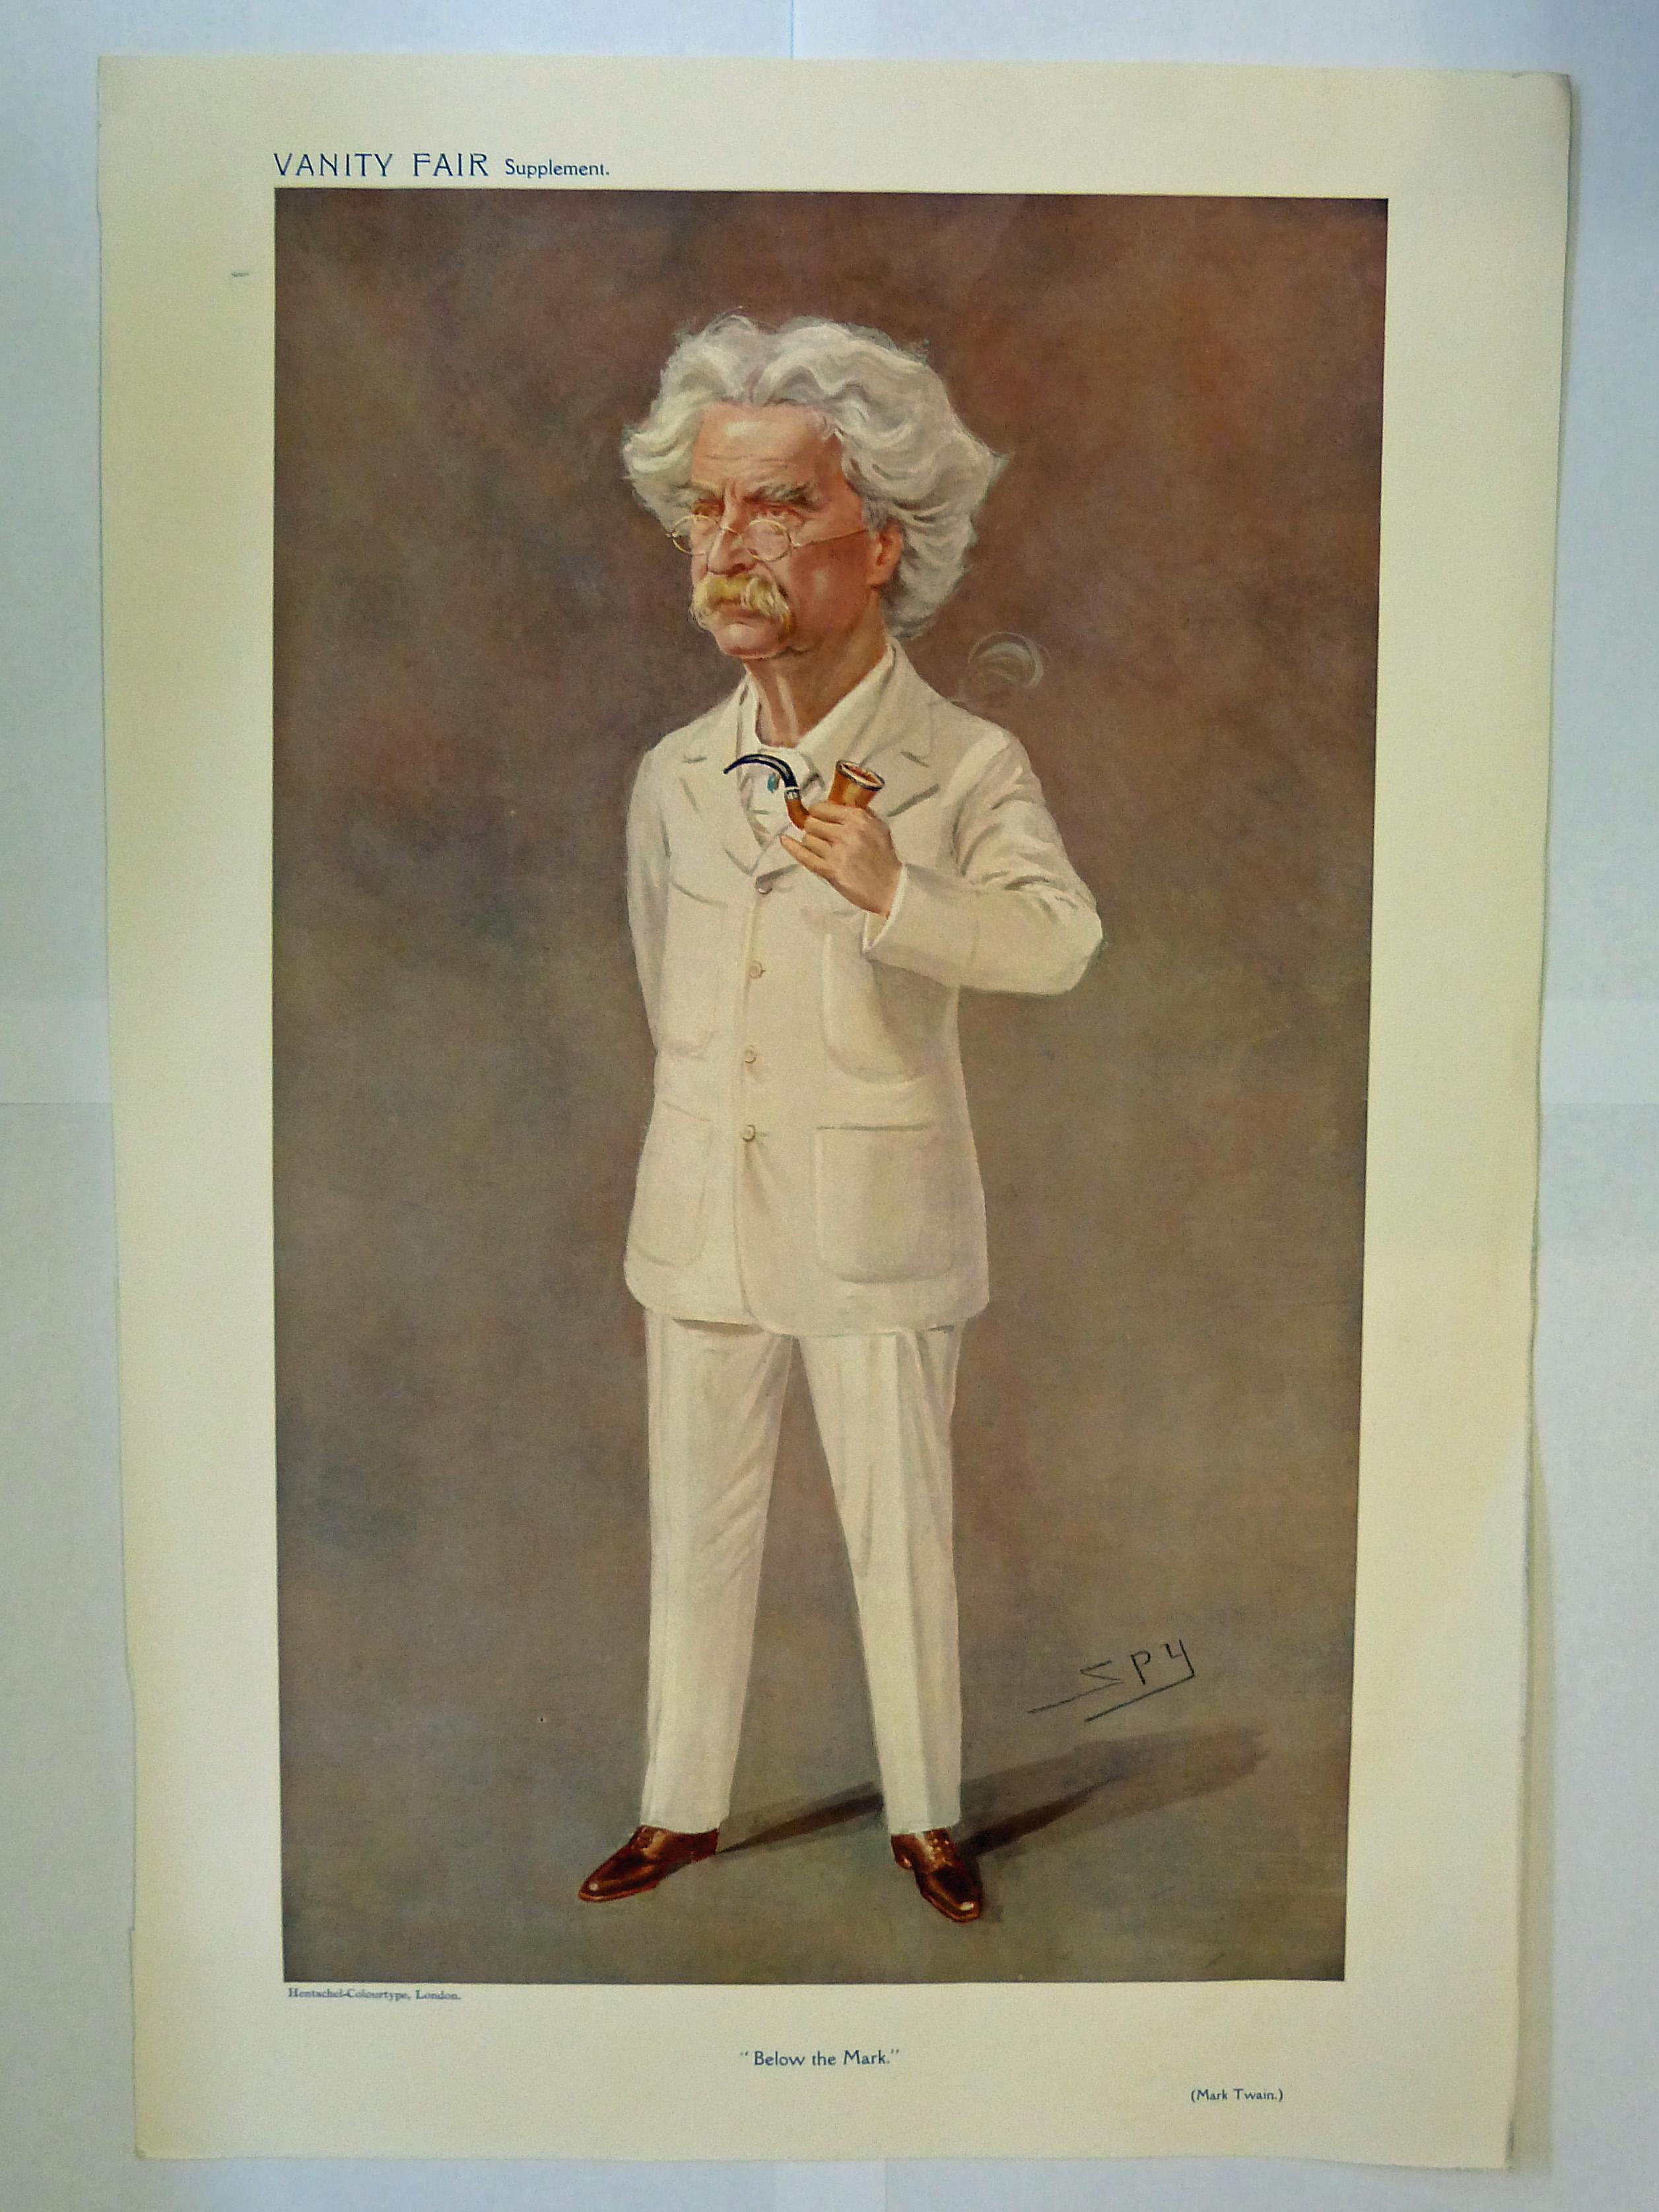 Original Vanity Fair Supplement Mark Twain Below the Mark May 13 1908